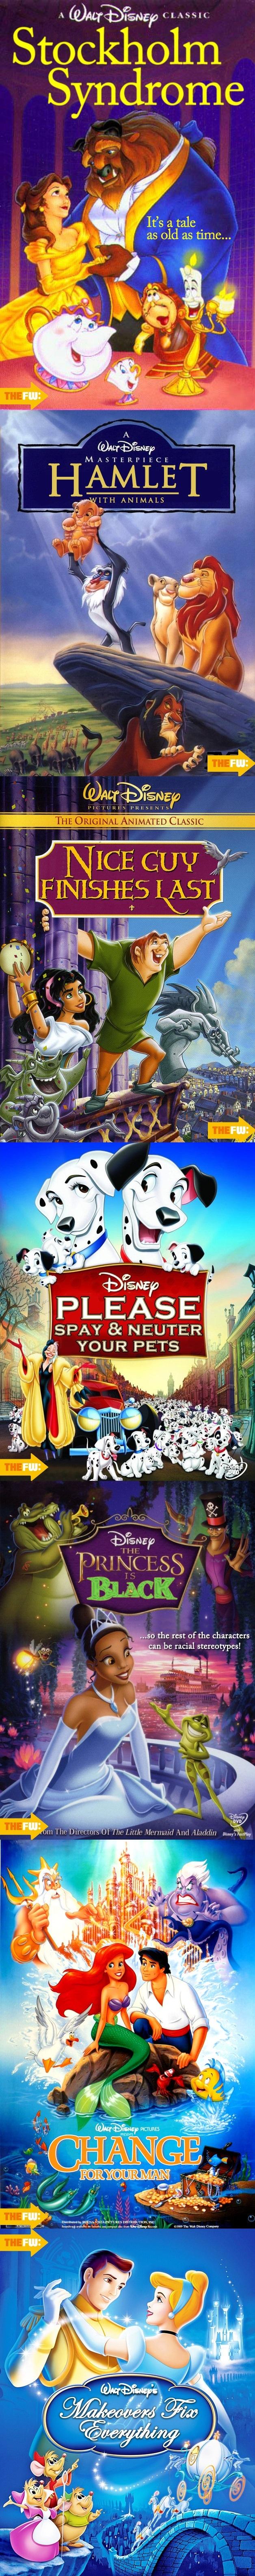 Alternate Disney Film Titles